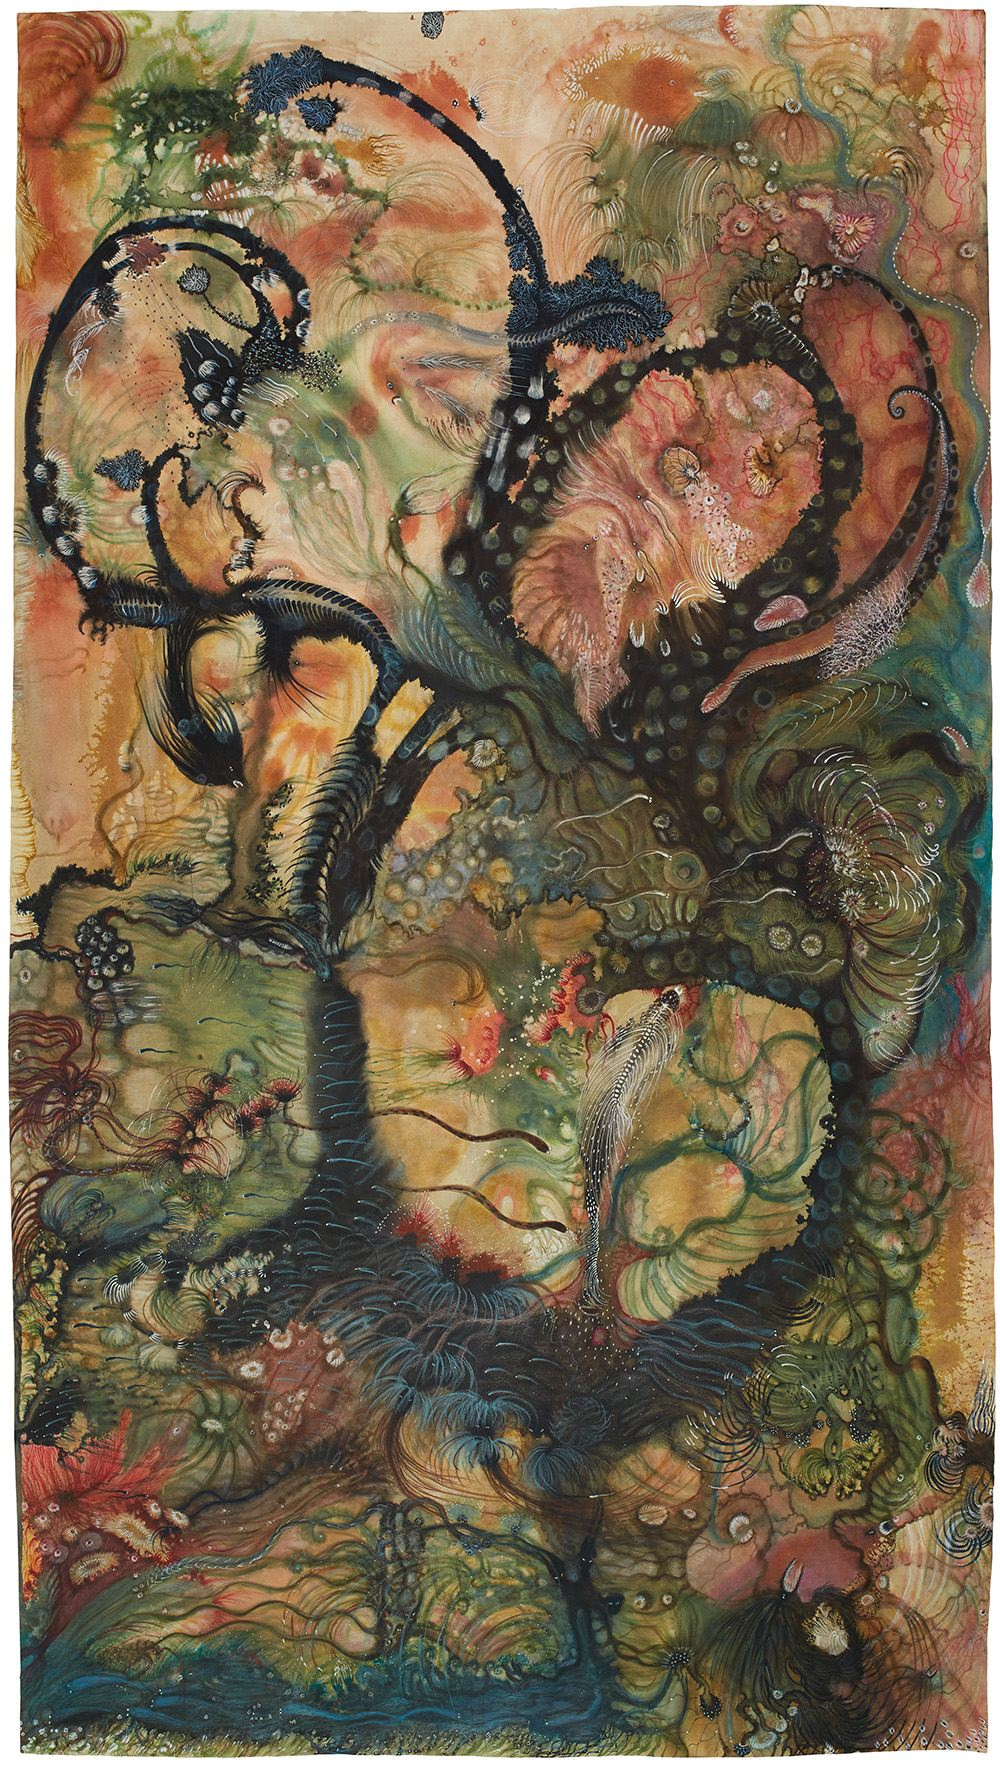 Izabella Ortiz    L'ecume des Songes  , 2017 Ink, felt pen, colored pencil, acrylic paint on paper 70.87 x 39.37 inches 180 x 100 cm IzO 43